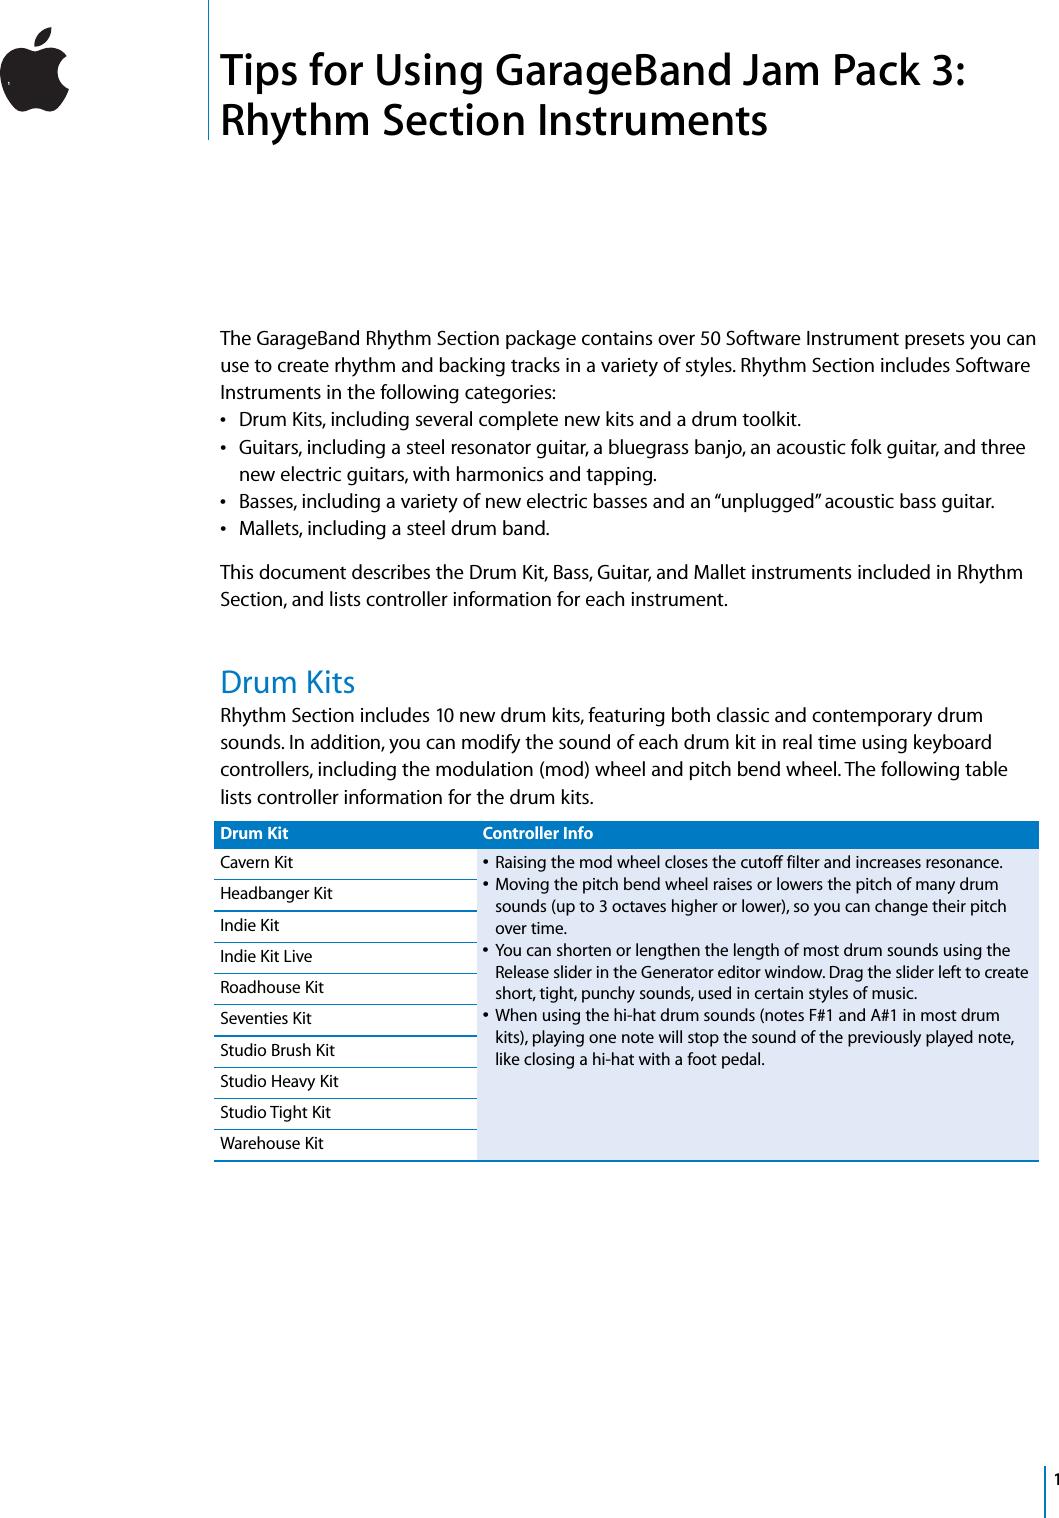 Apple Jam Pack GarageBand 3 User Manual Garage Band 3: Rythm